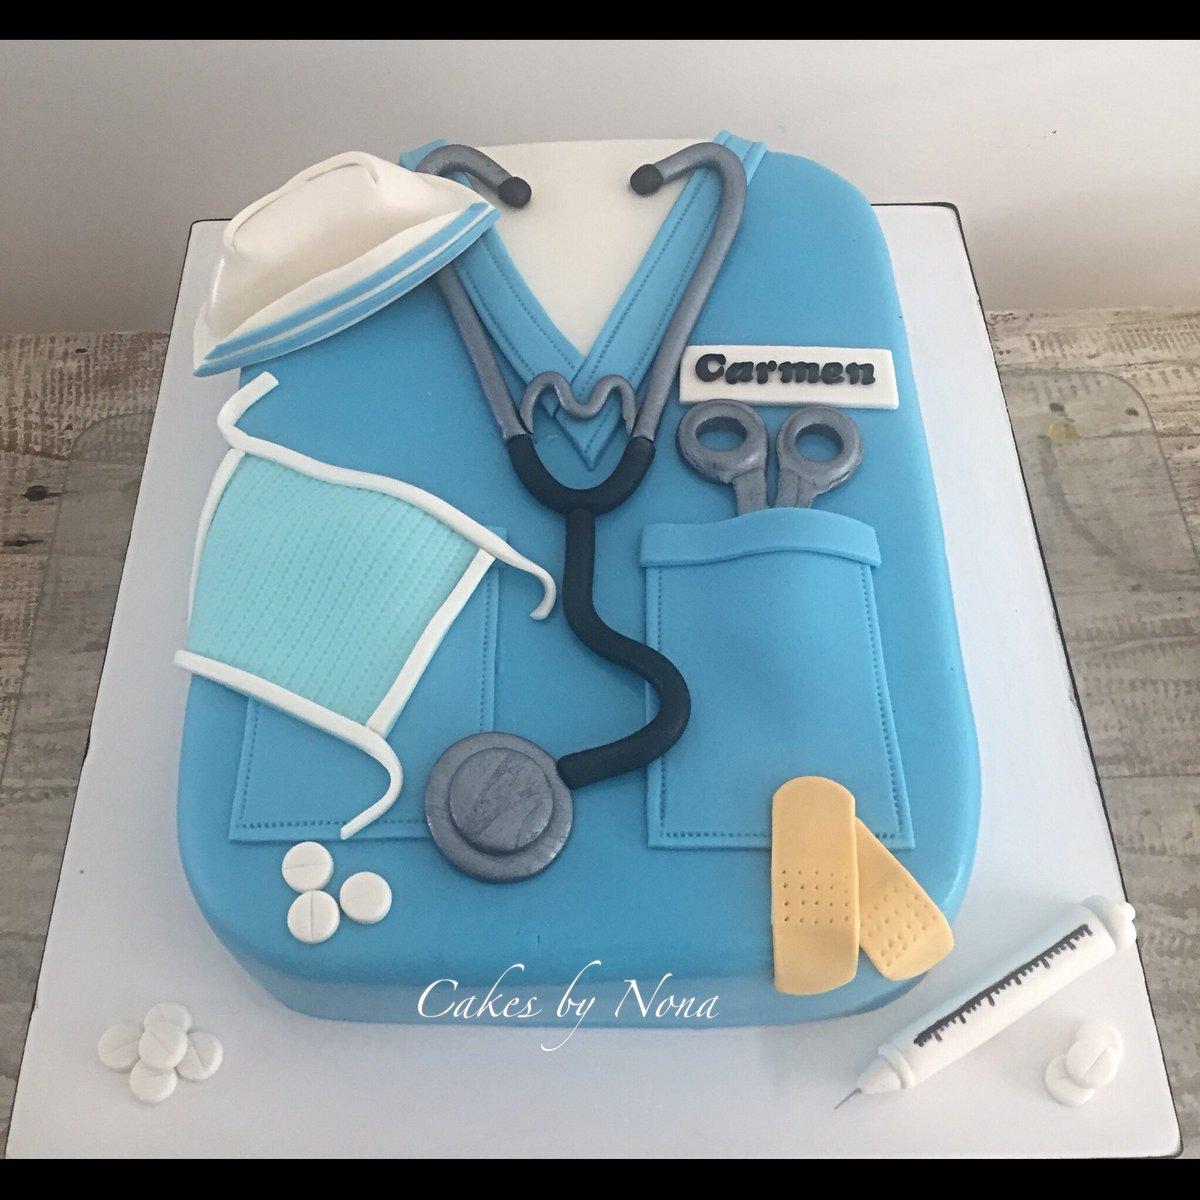 Nurse Themed Bday Cake Nursecake Enfermera Pastelenfermera Cakes Cakesbynona Fondantcakes Fondantart Fondantartist Customcakes